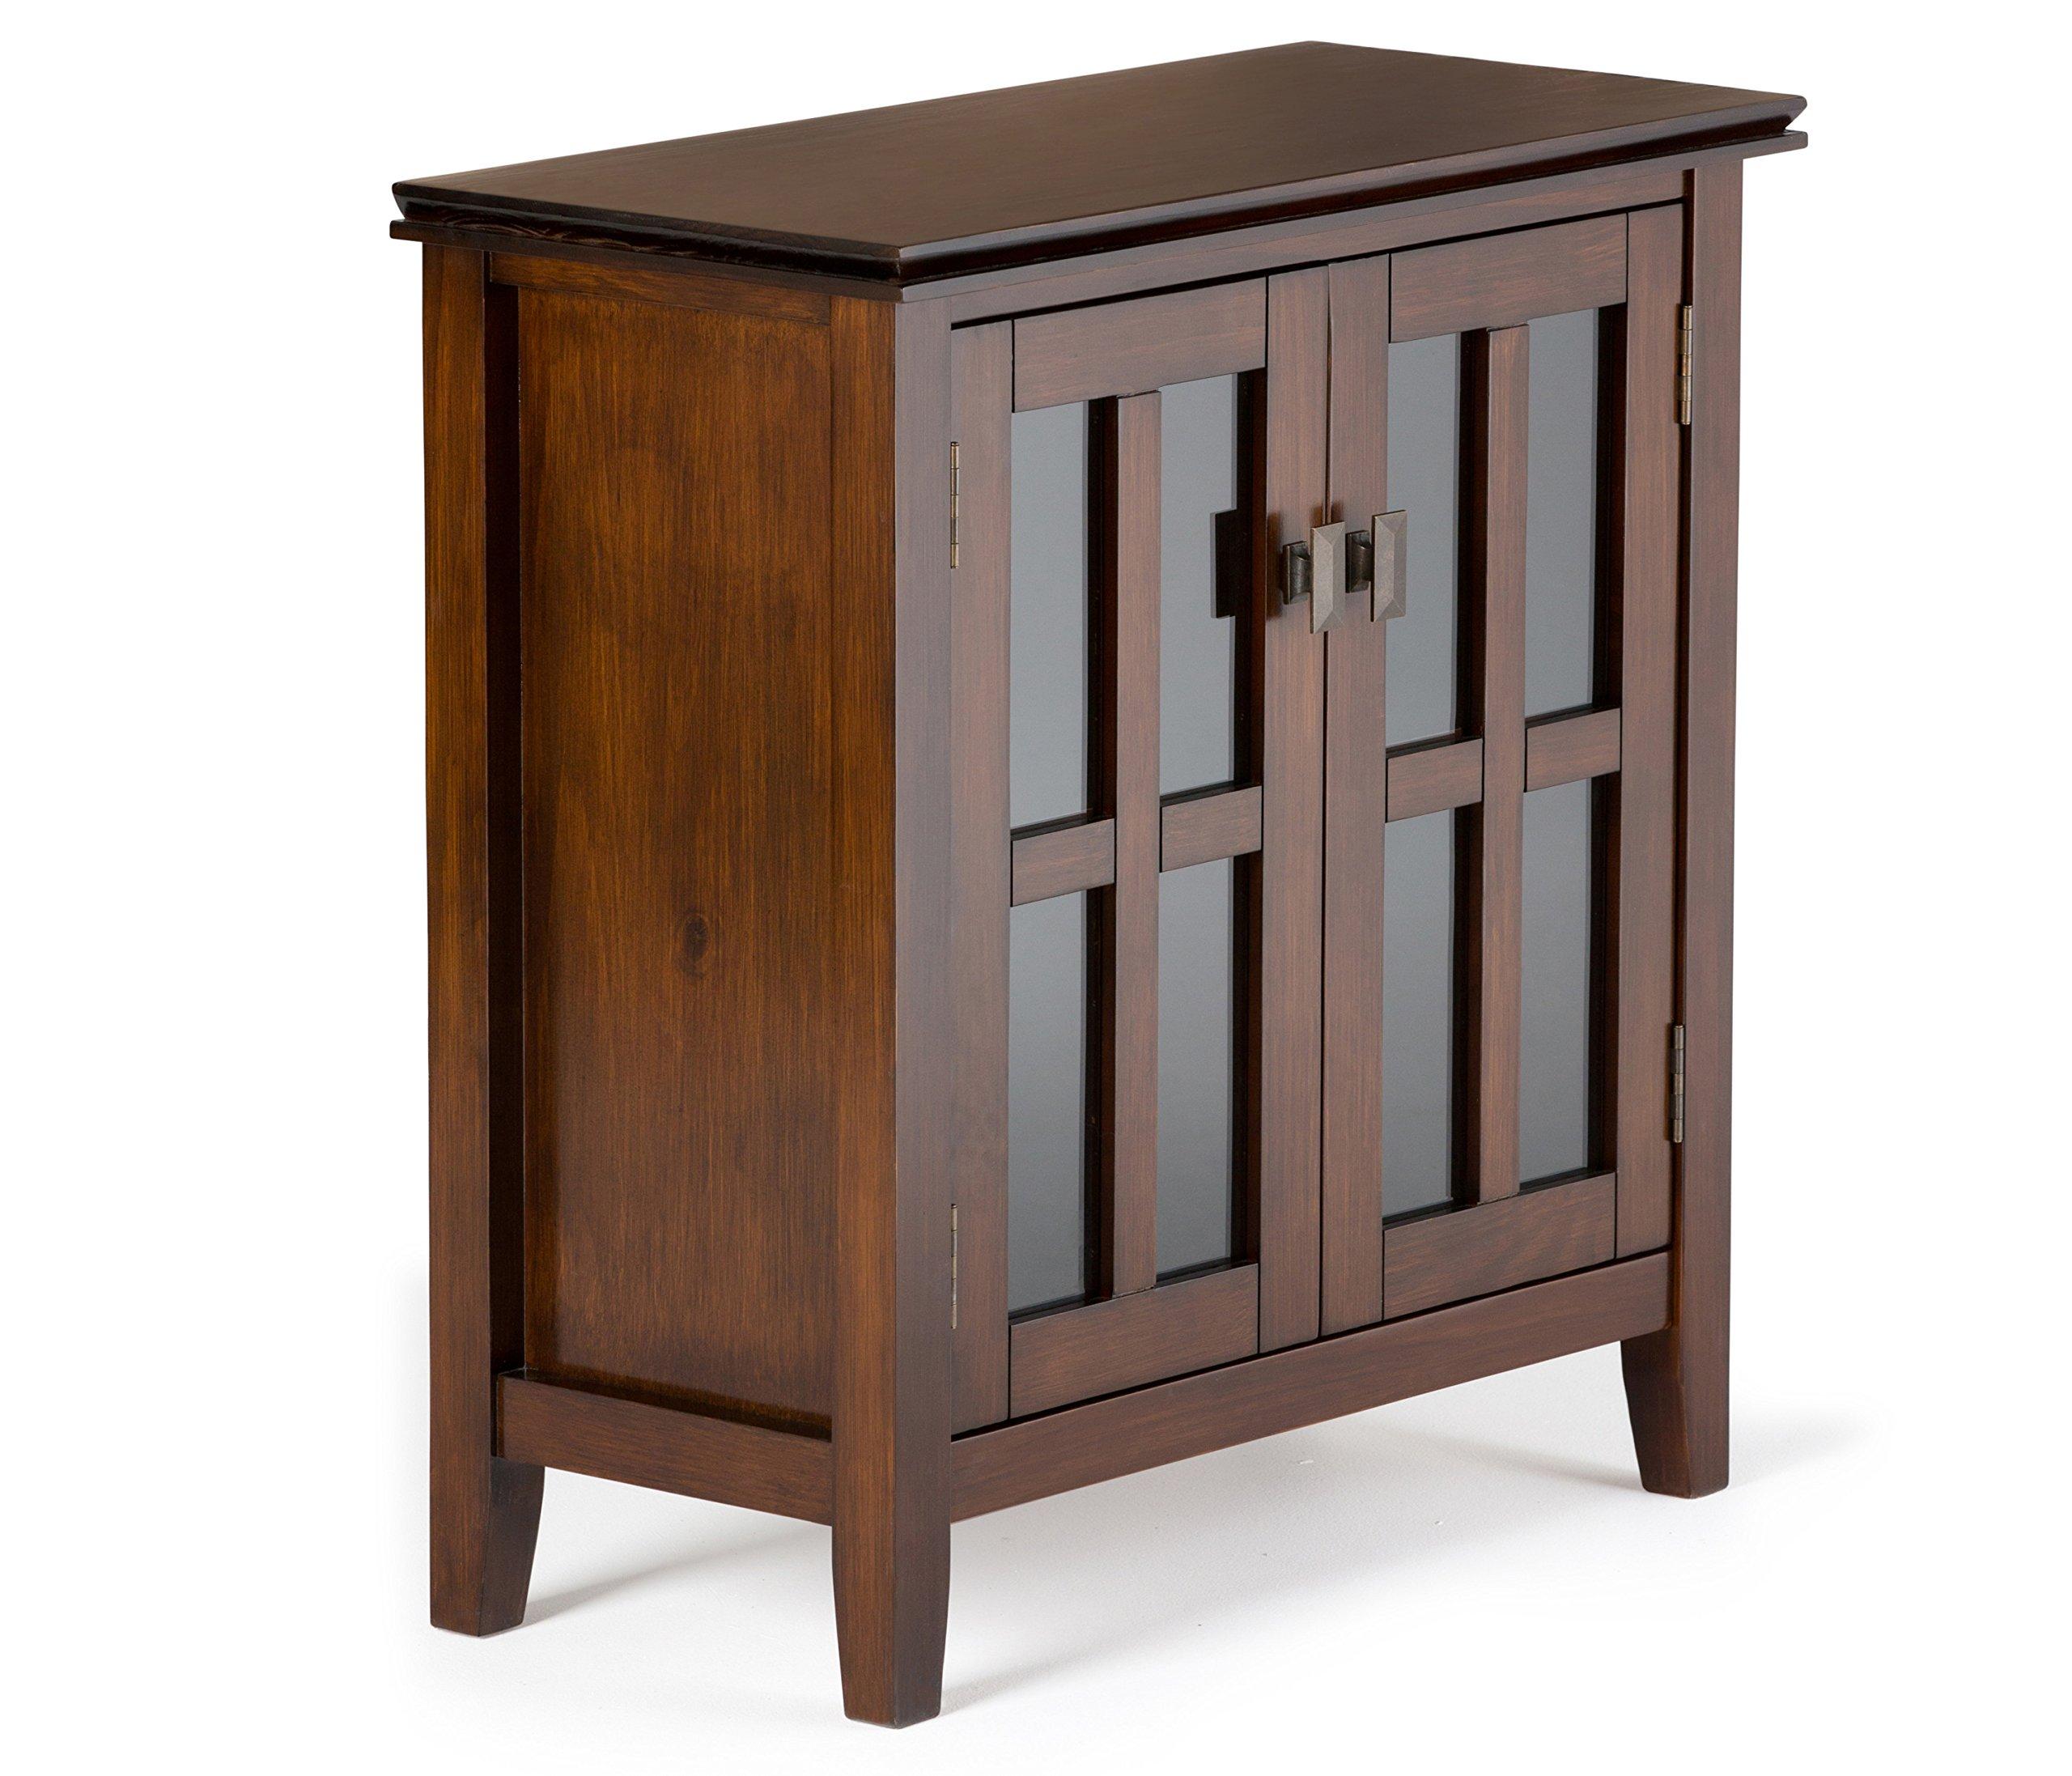 Simpli Home Artisan Solid Wood Low Storage Cabinet, Medium Auburn Brown by Simpli Home (Image #1)